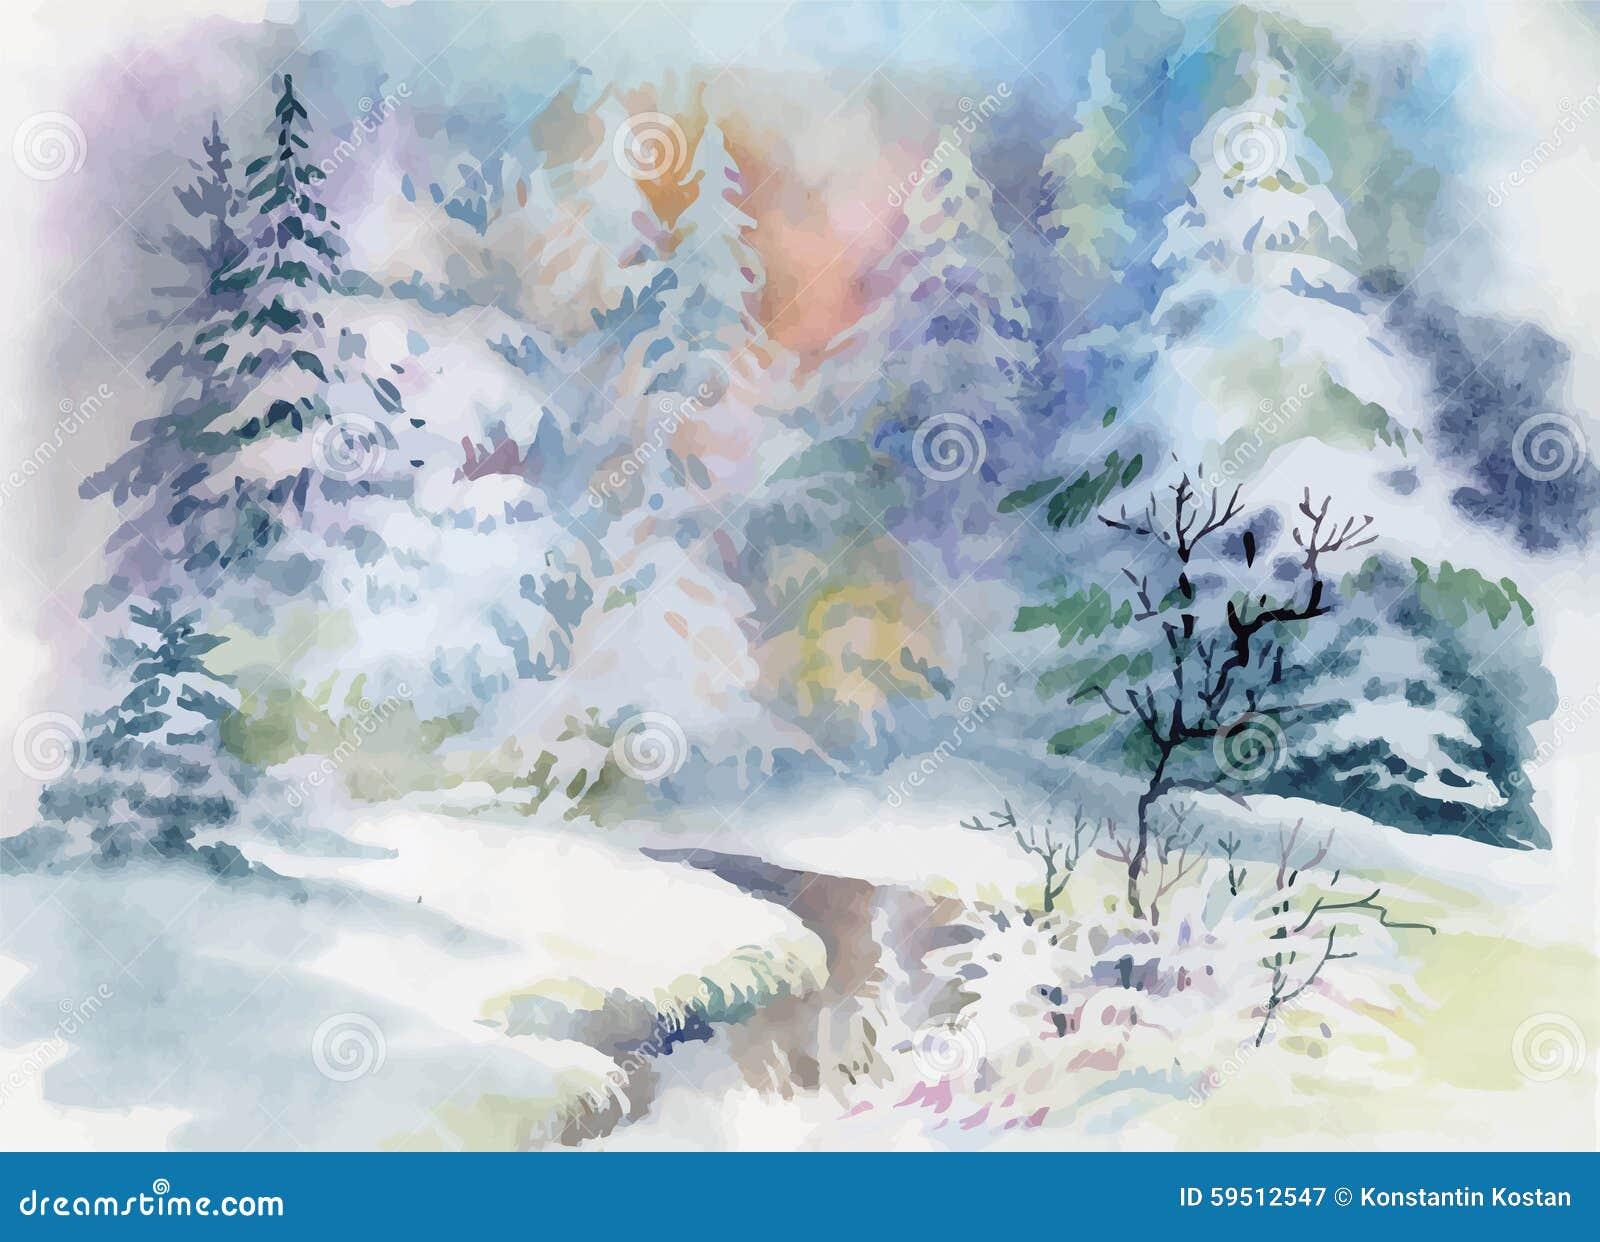 Watercolor winter landscape illustration vector